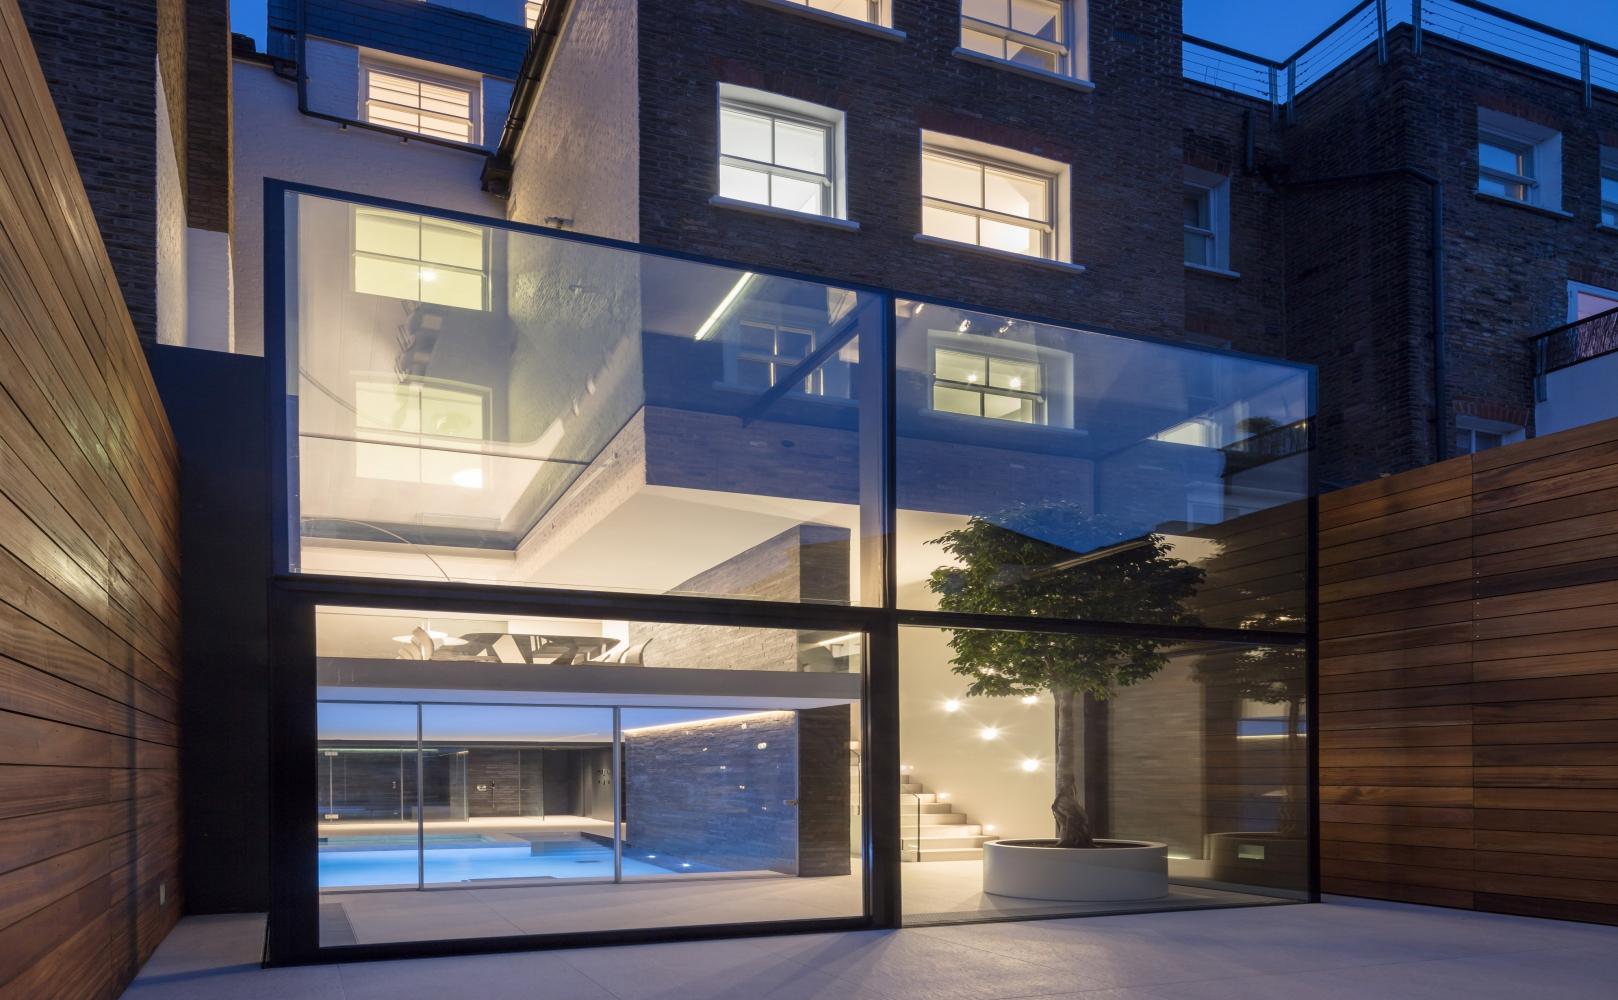 xvictorian-remix-guarnieri-architects-architecture-residential_dezeen_2364_col_0